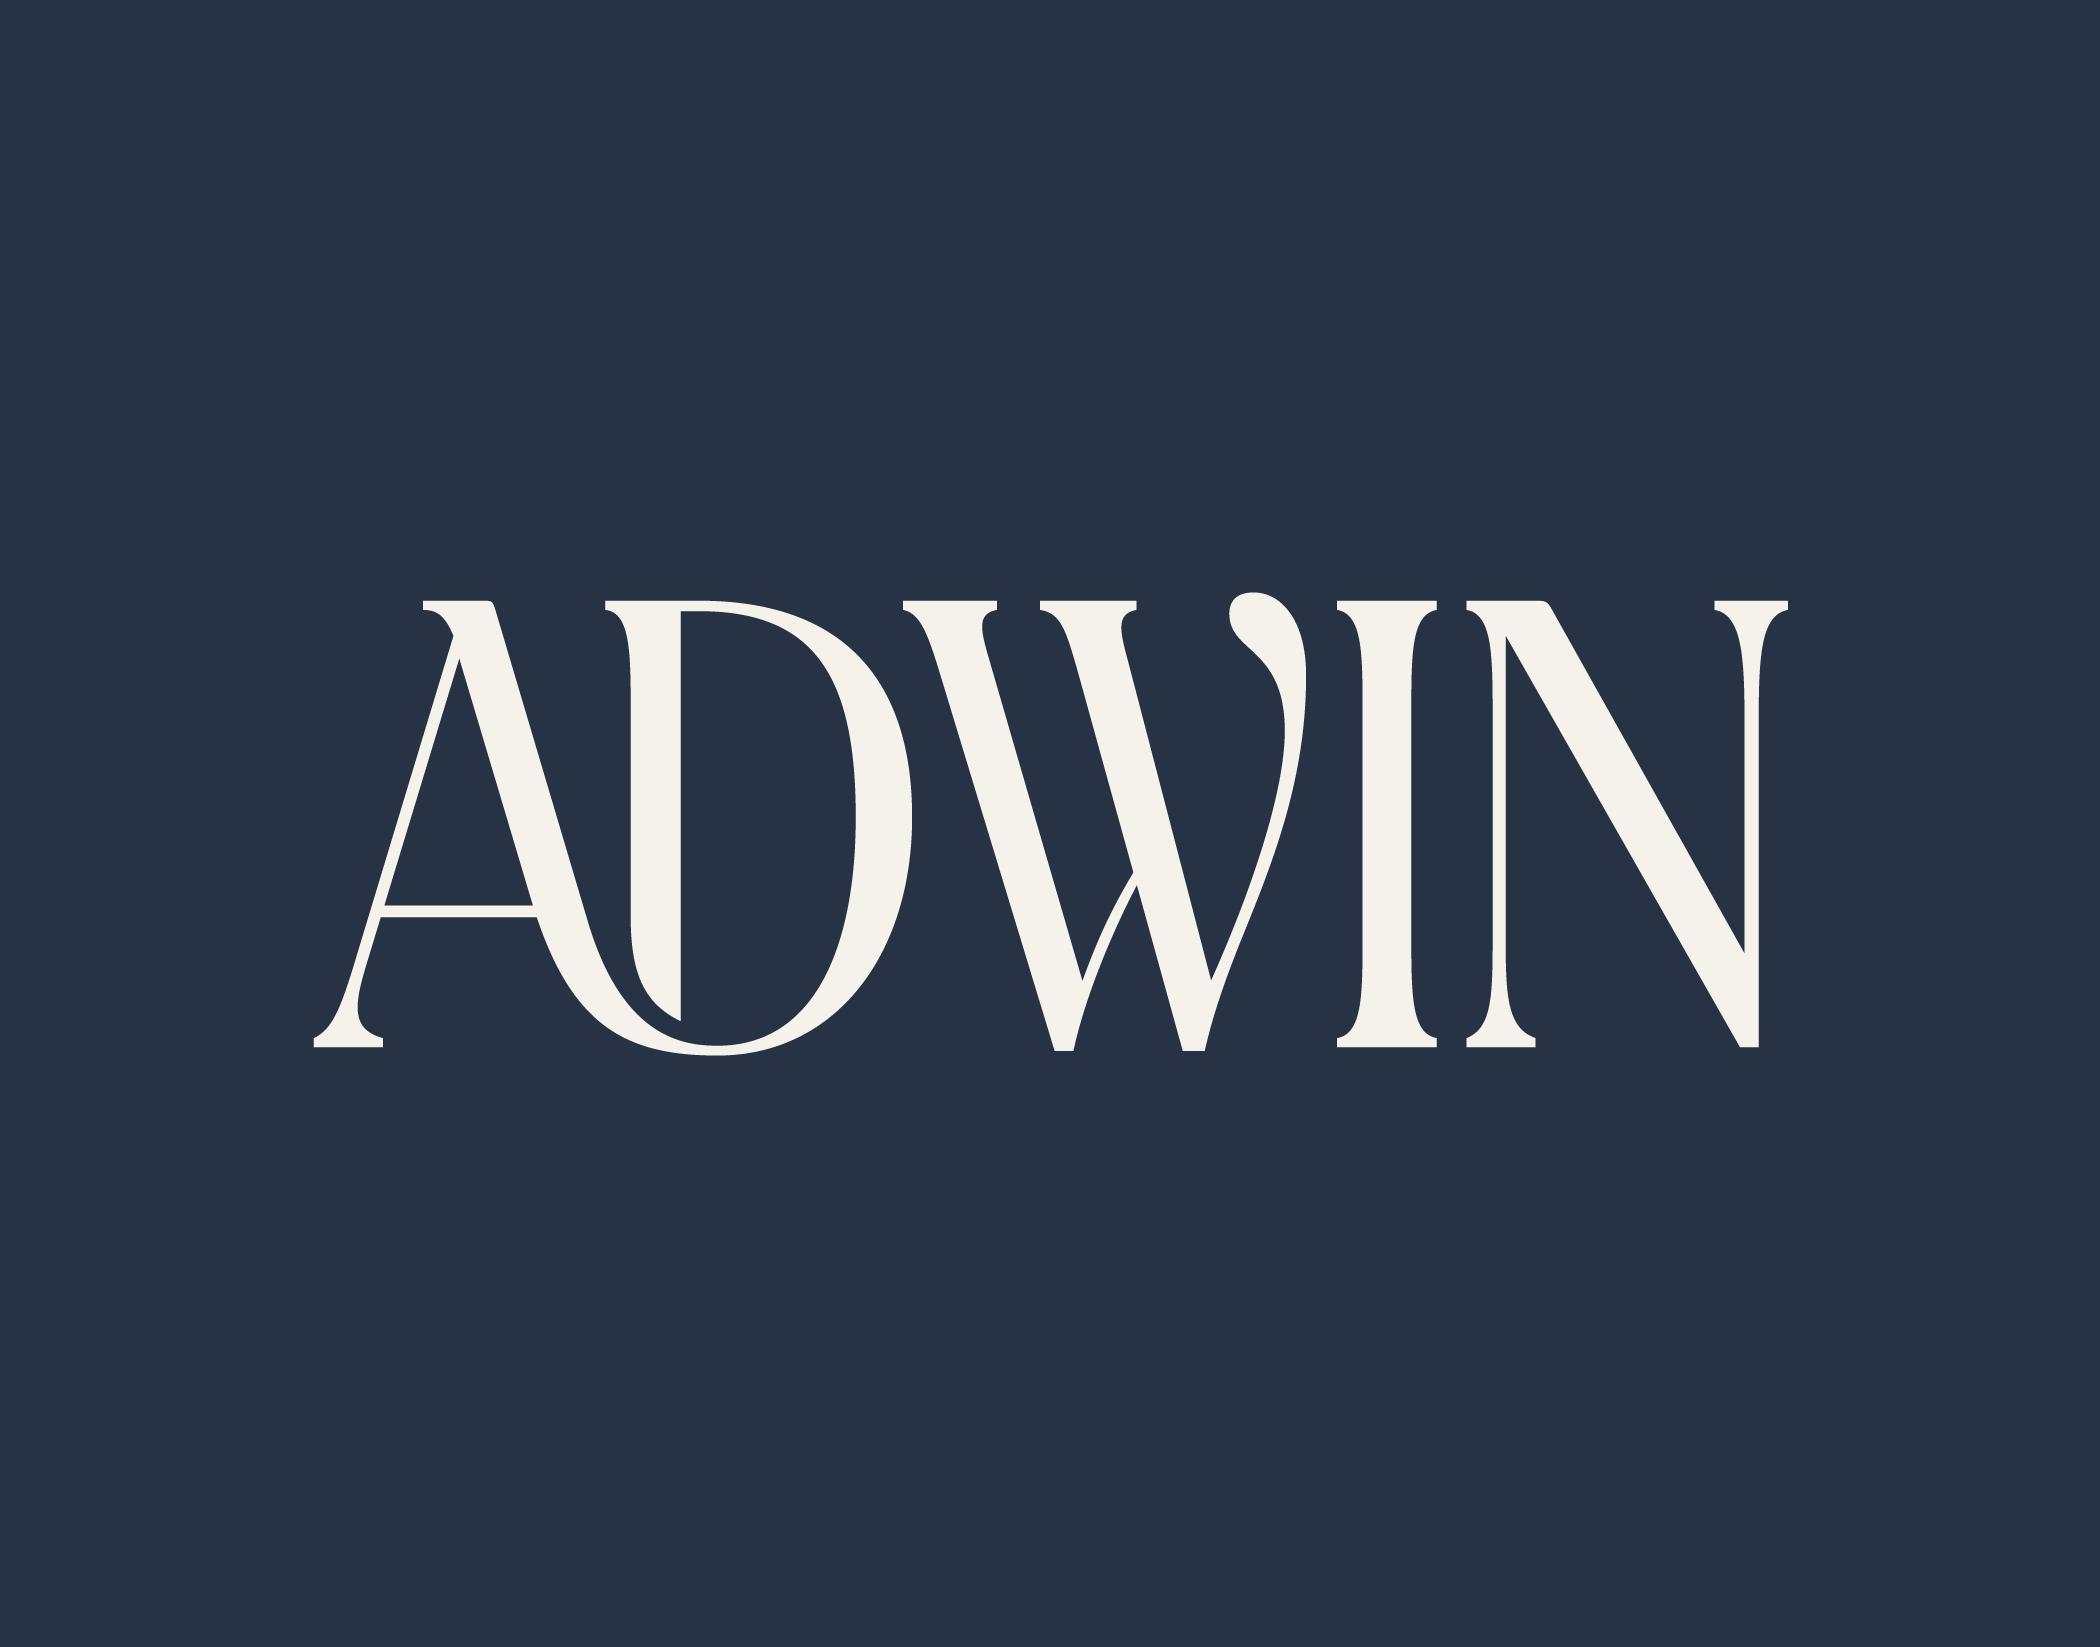 Adwin2